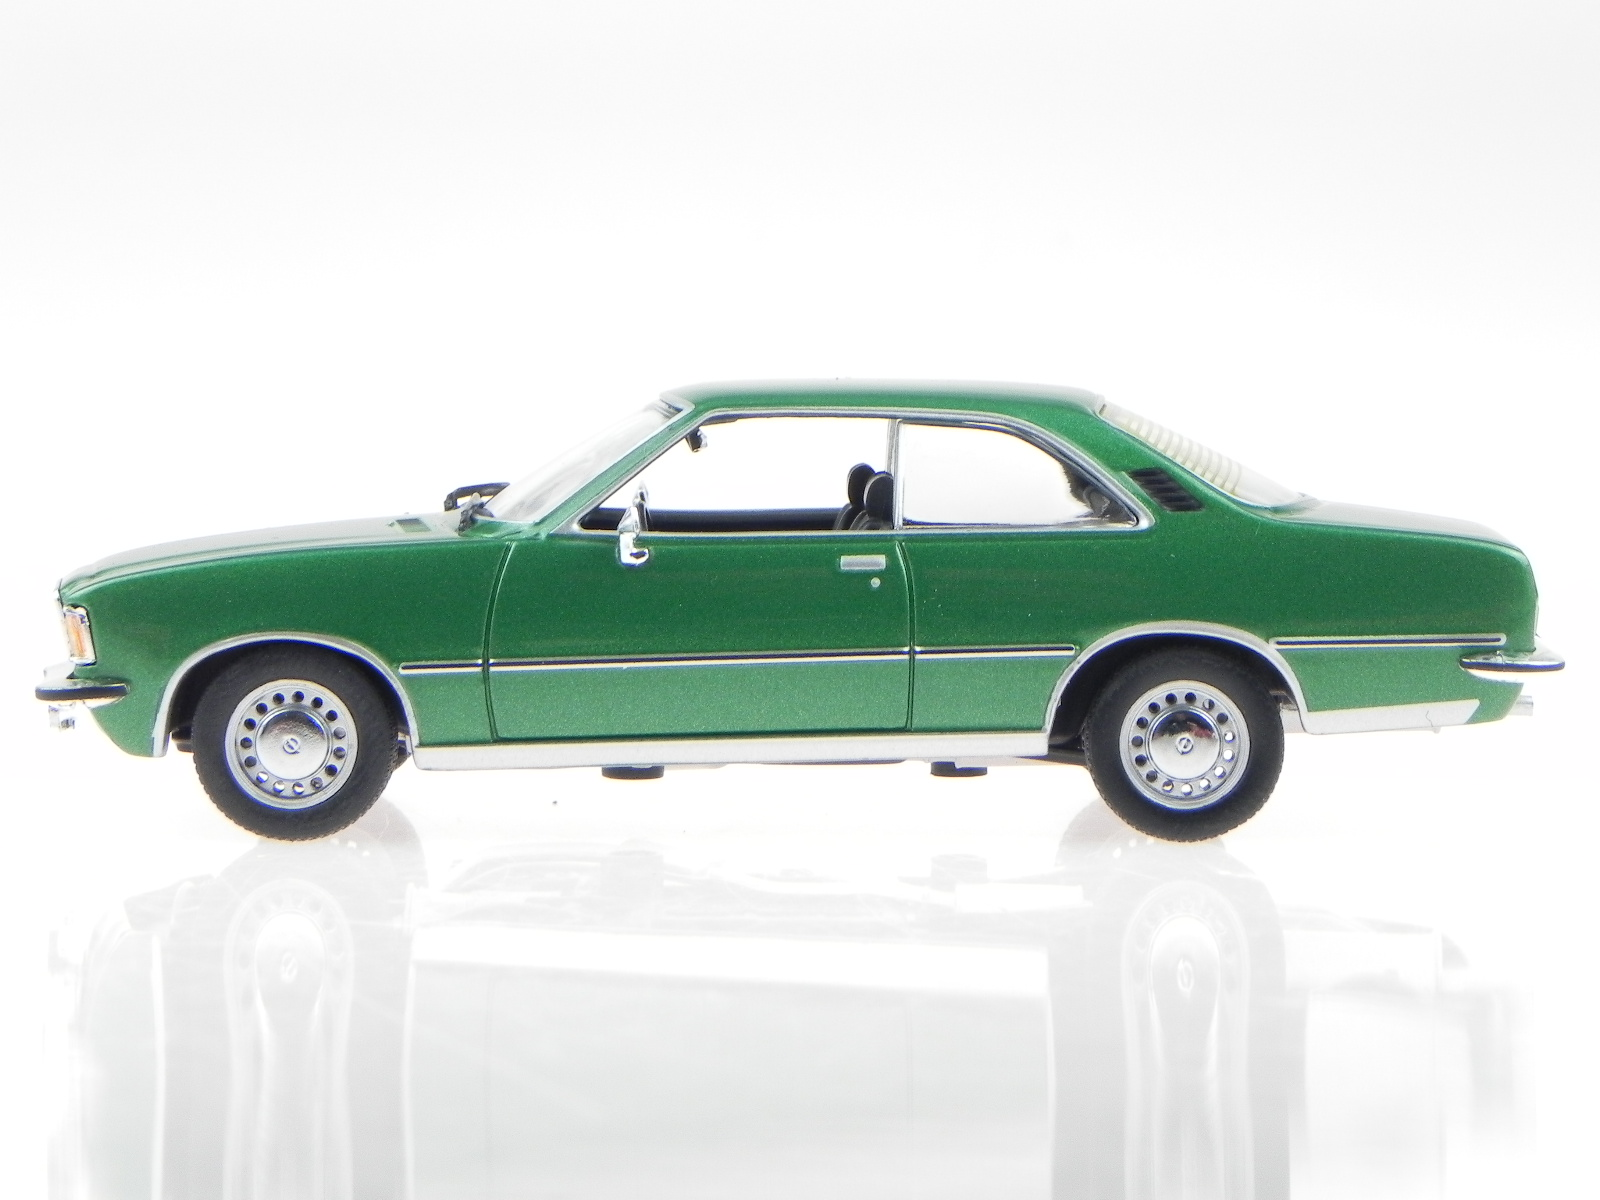 Opel-Rekord-D-cupe-verde-coche-en-miniatura-400044022-Minichamps-1-43 miniatura 2